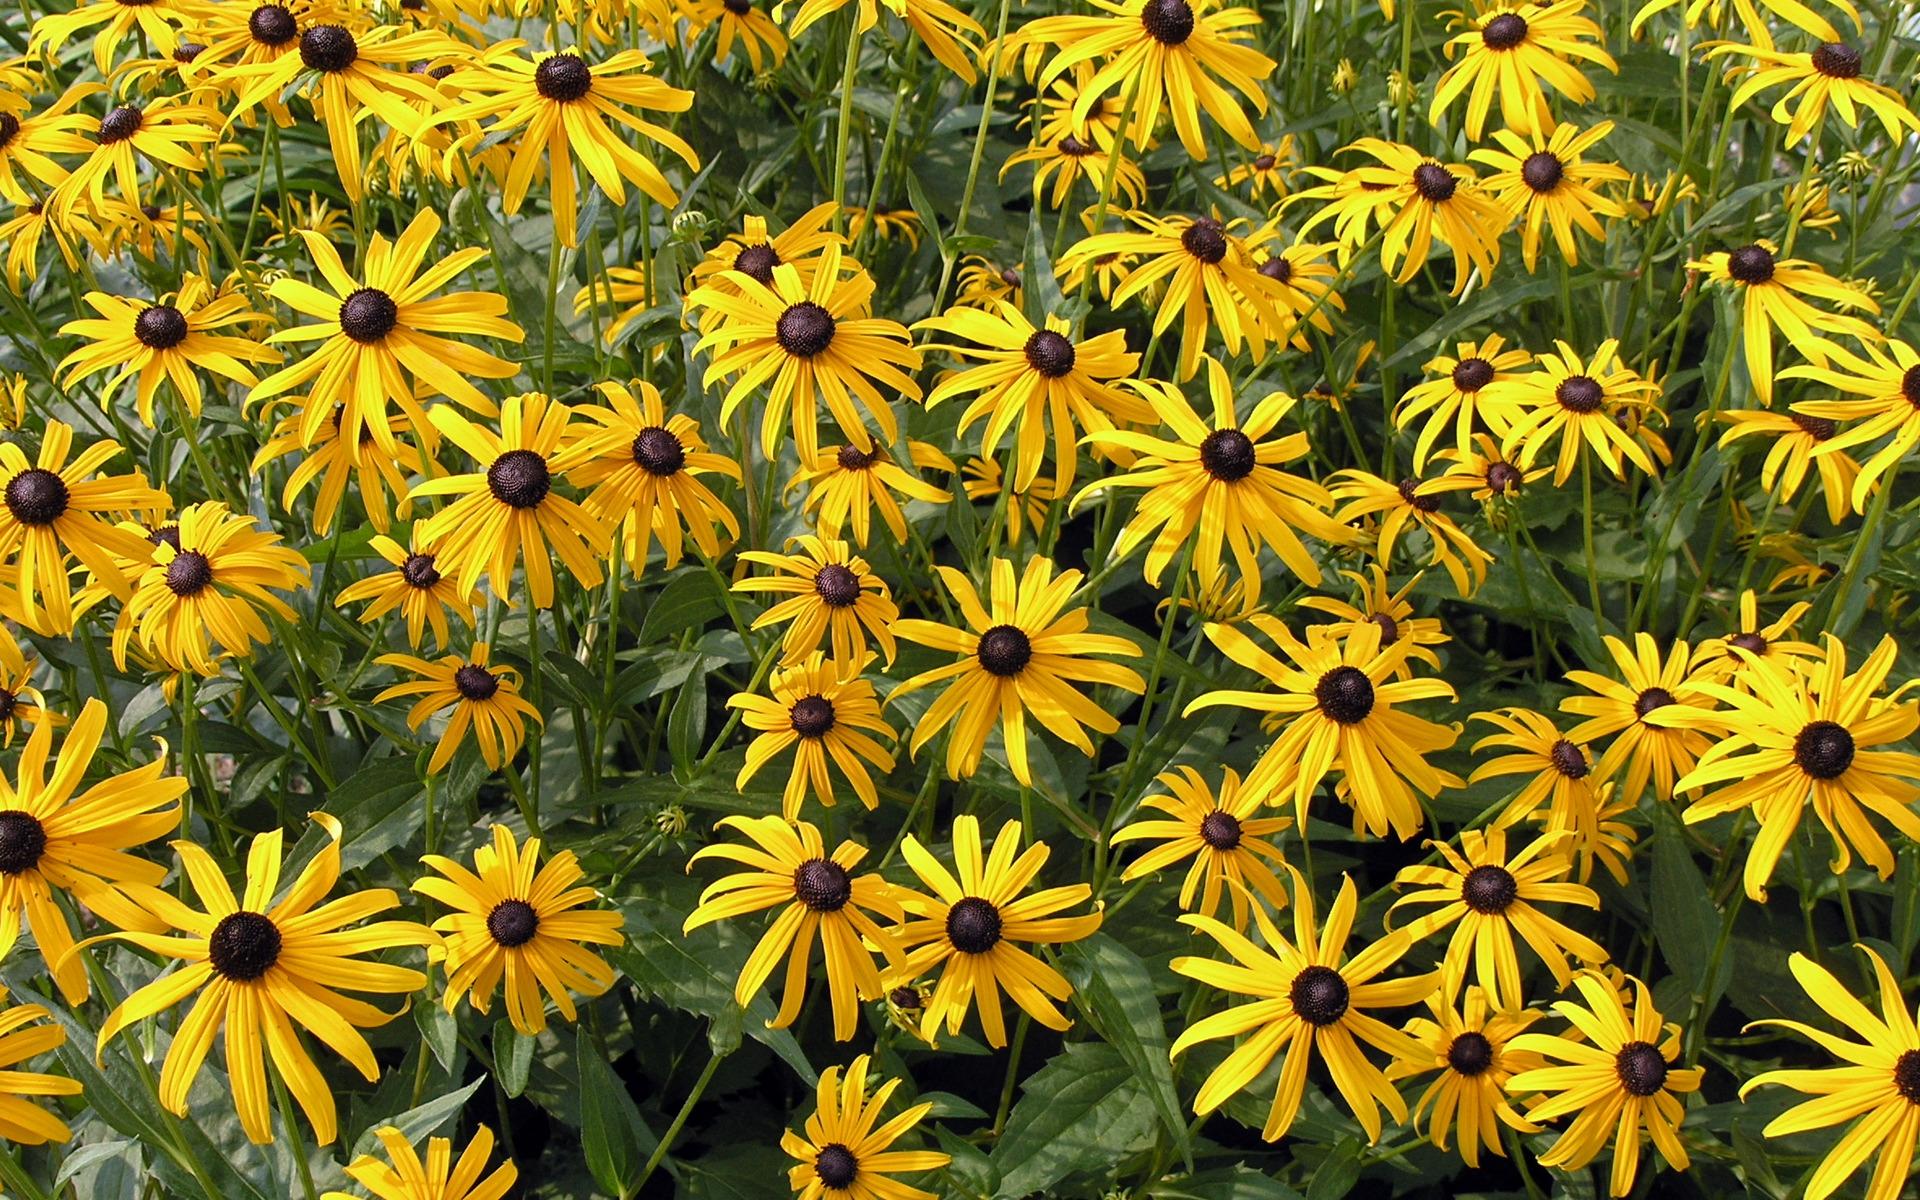 Free Rudbeckia Flowers Wallpaper 34810 1920x1200 px